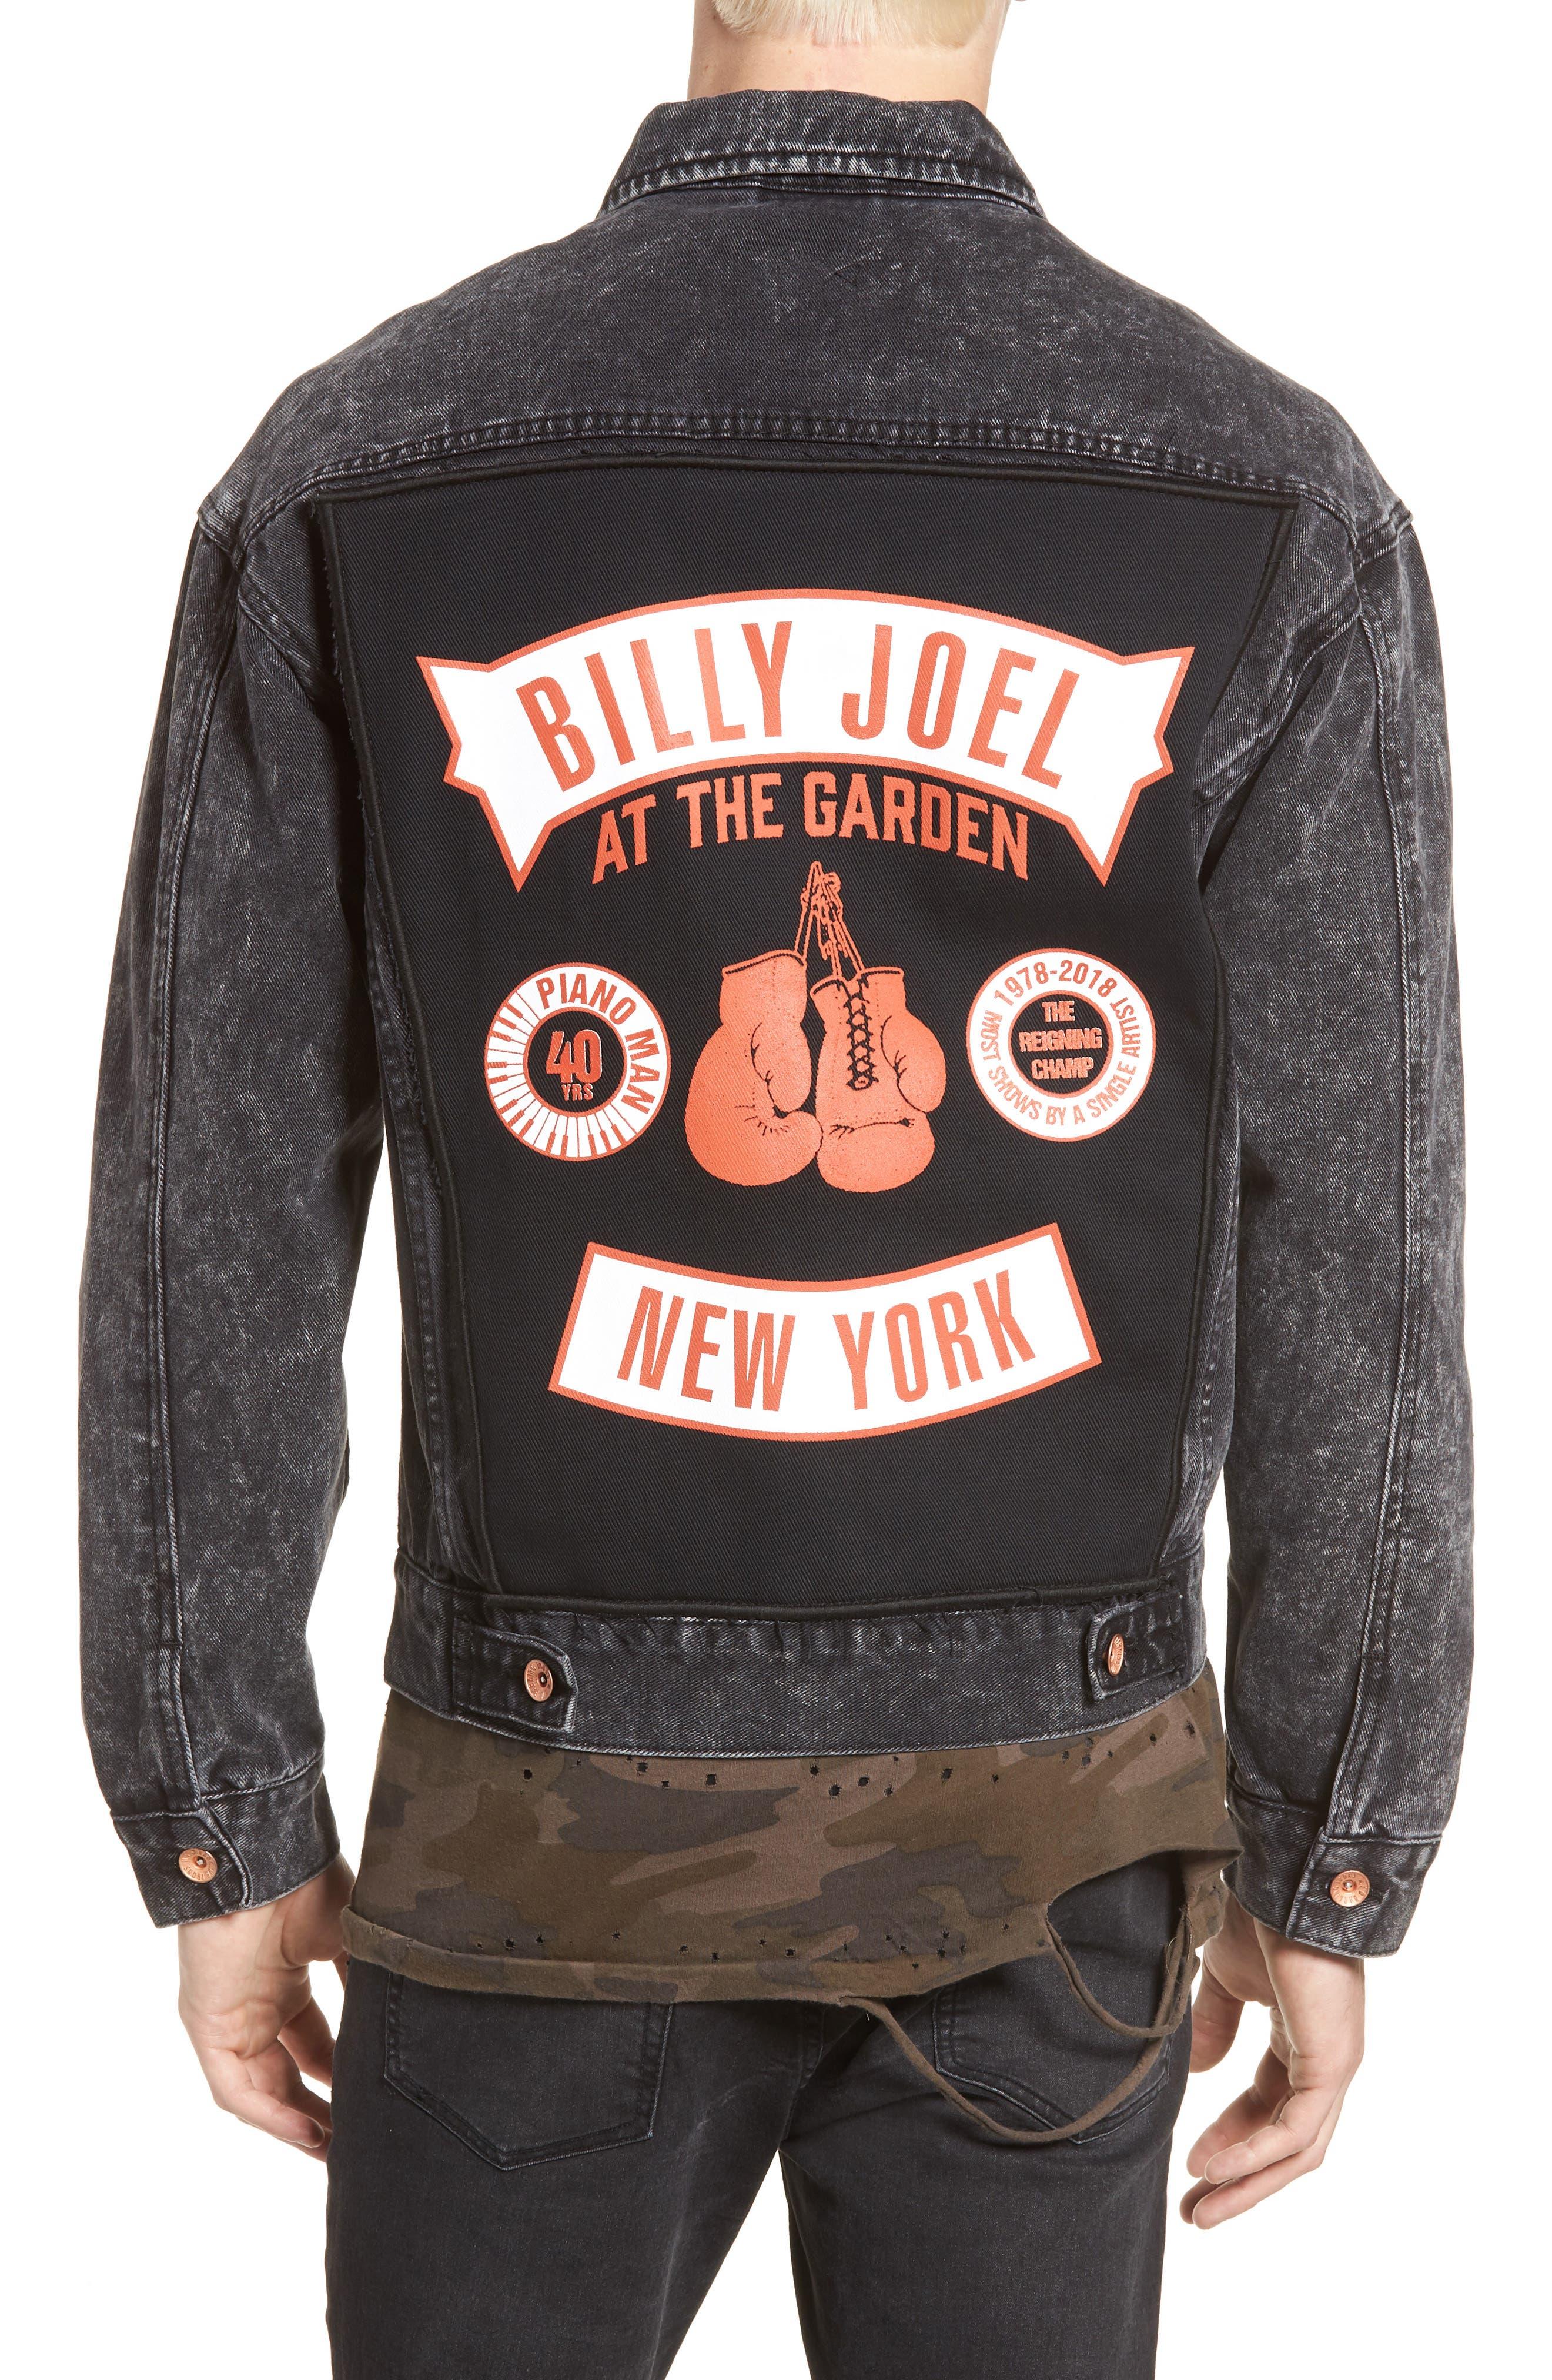 Billy Joel At the Garden Denim Jacket,                             Alternate thumbnail 2, color,                             Black Acid